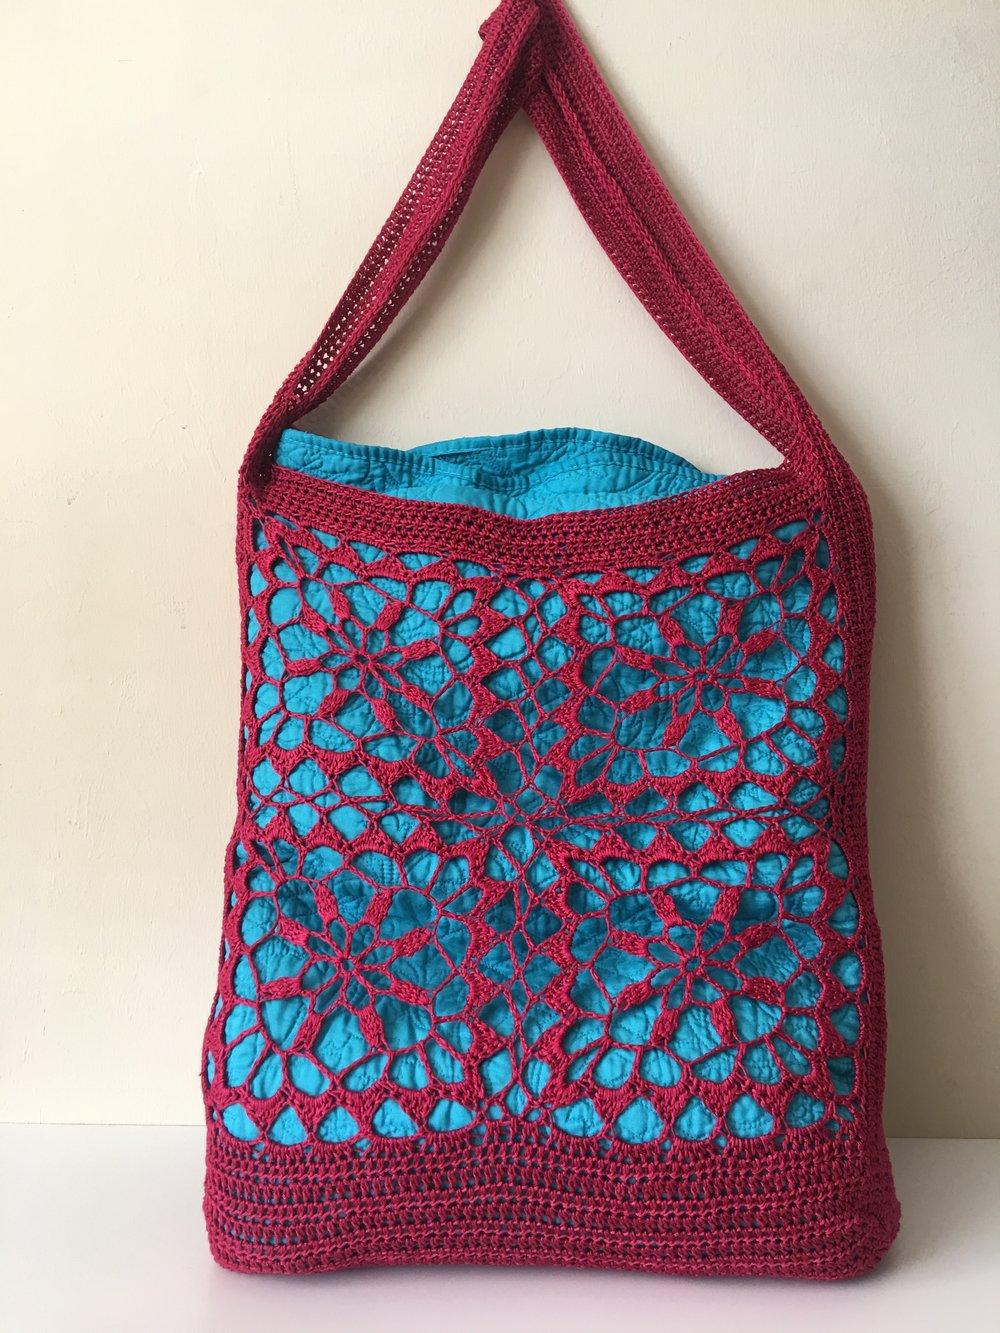 Million Dollar Red Be So Sporty Yarn Crochet Tote Bag FREE Pattern ...